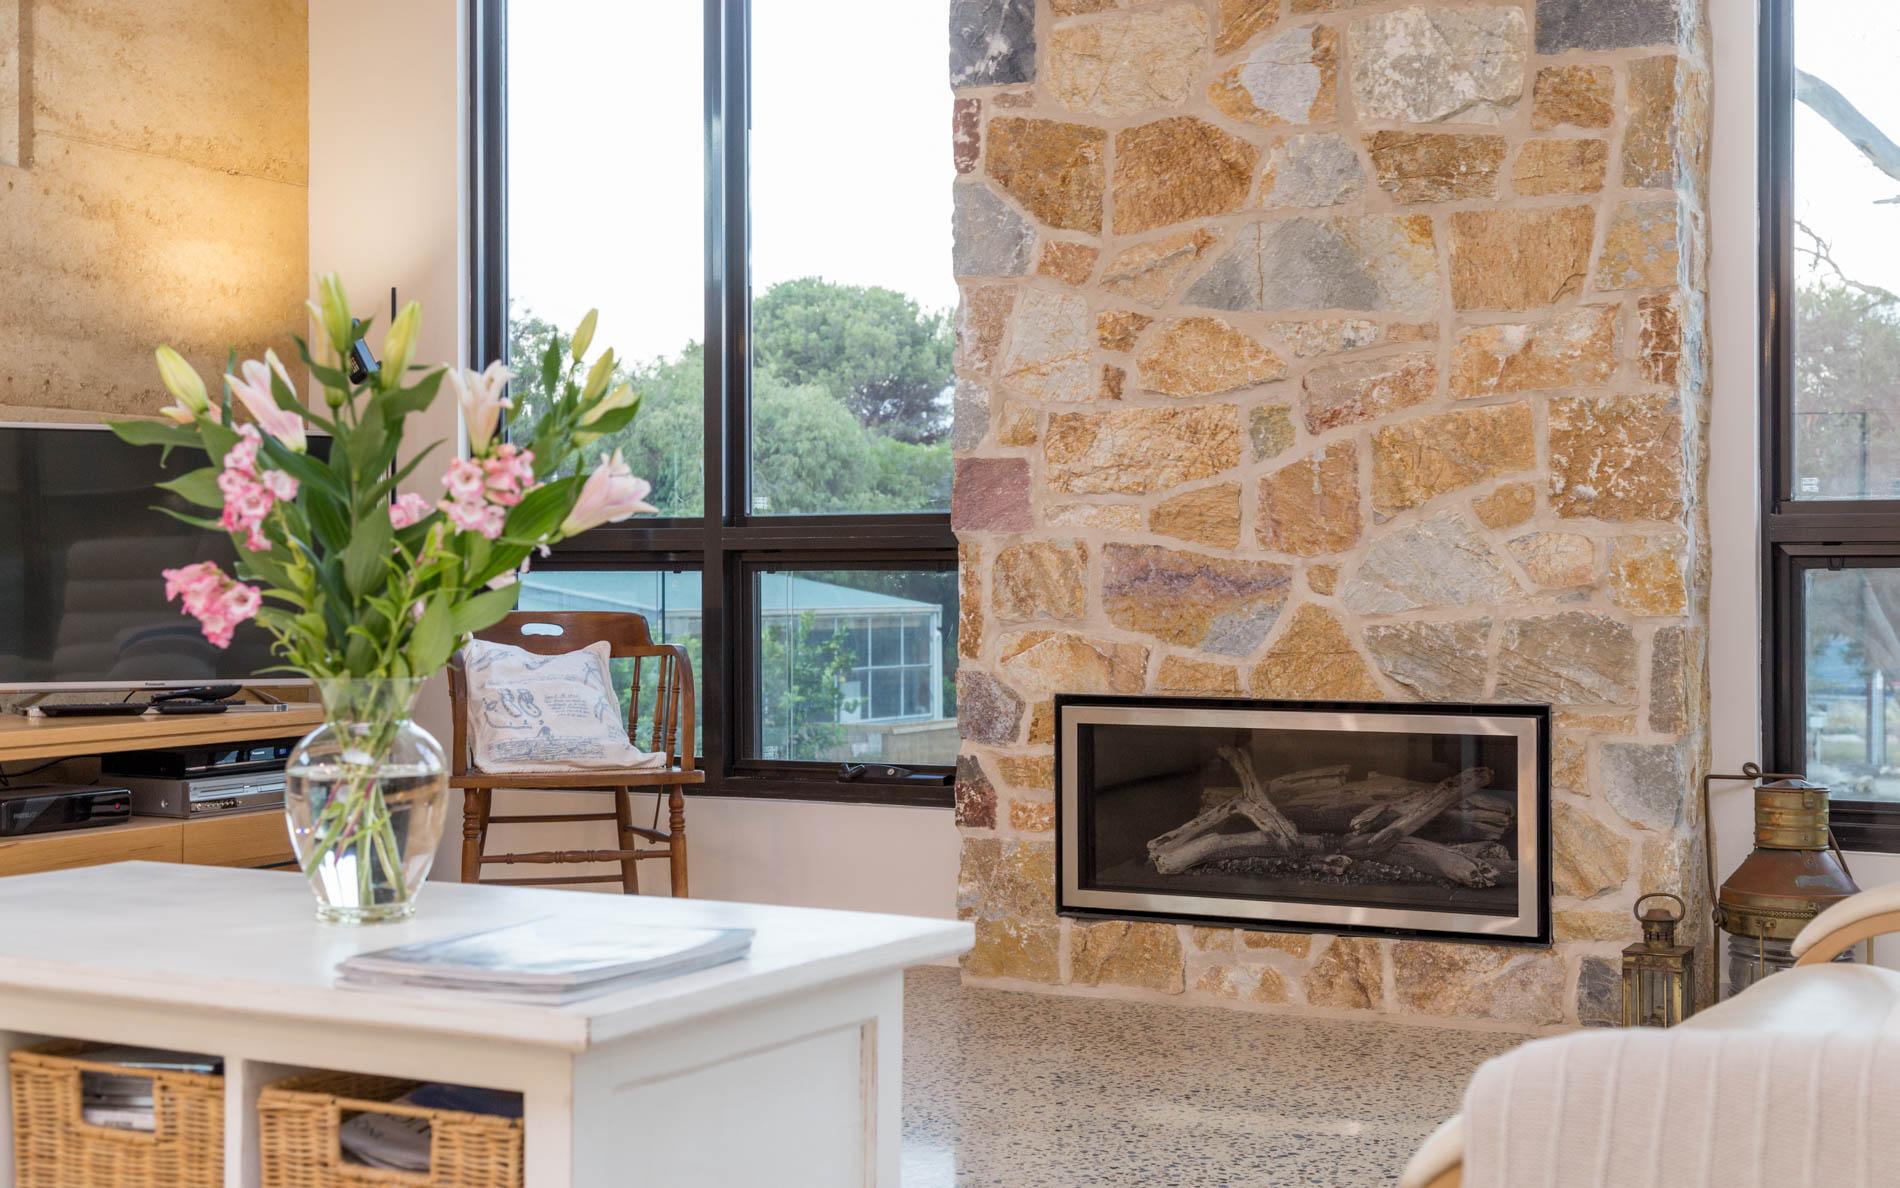 New Home, Custom Home, Family Home, Design, Builders, Award Winning, Single Storey, Goolwa, Fleurieu, Wood Fire, Fireplace, Living Area